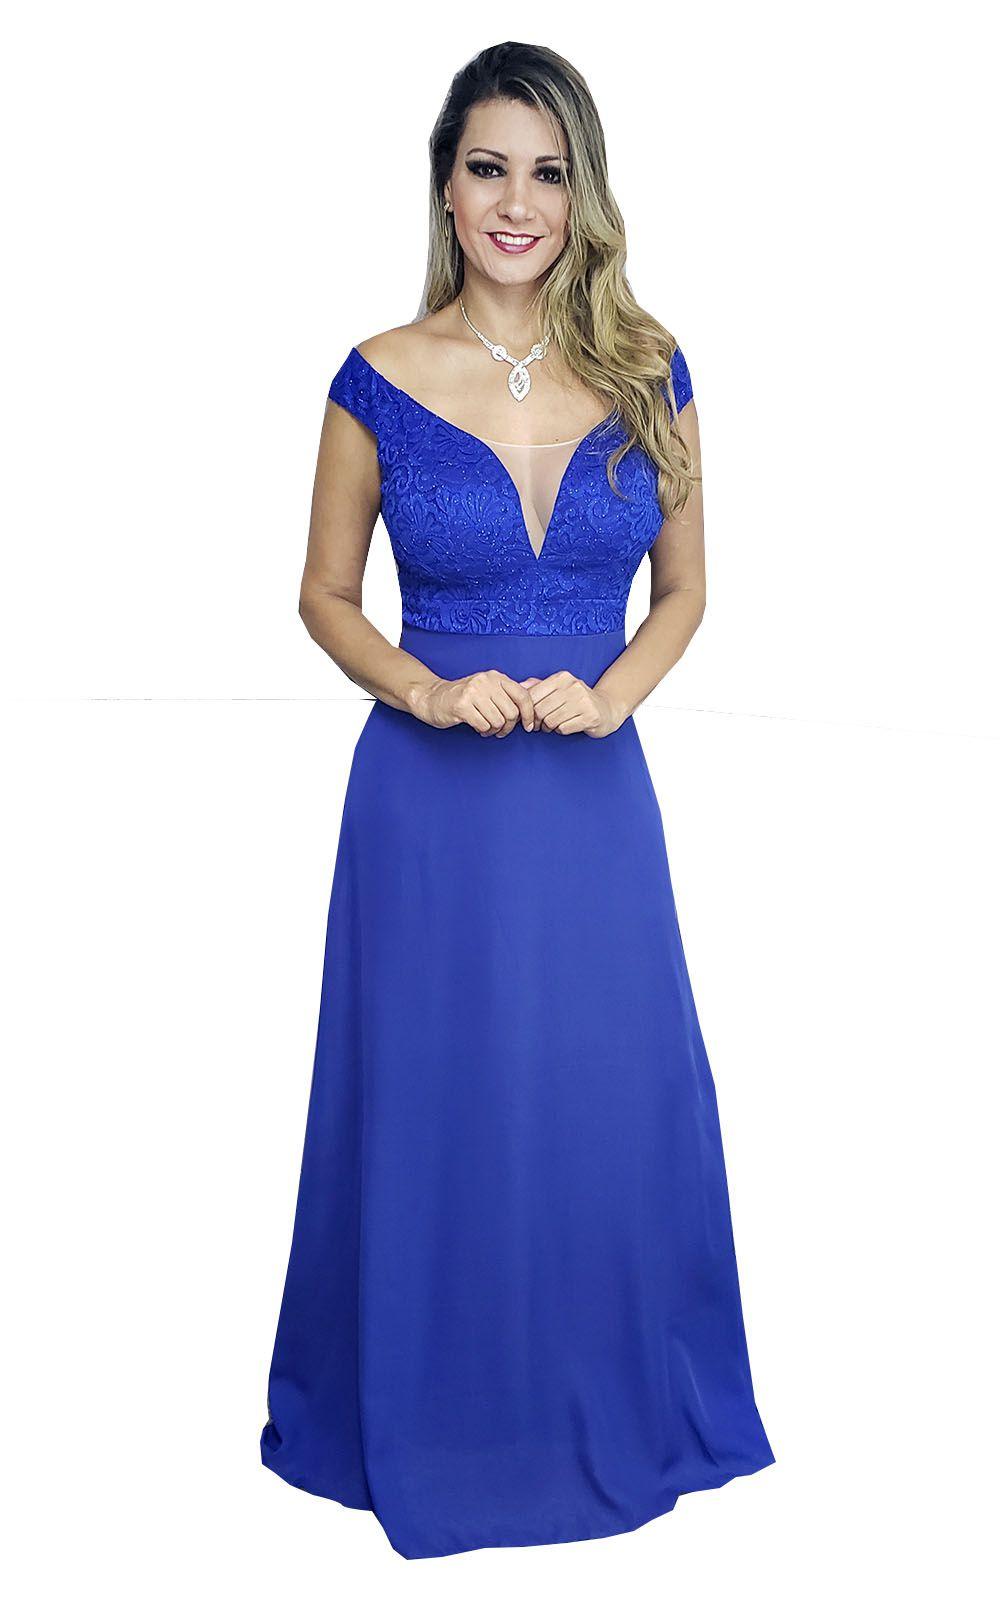 Onde comprar vestido de festa azul royal